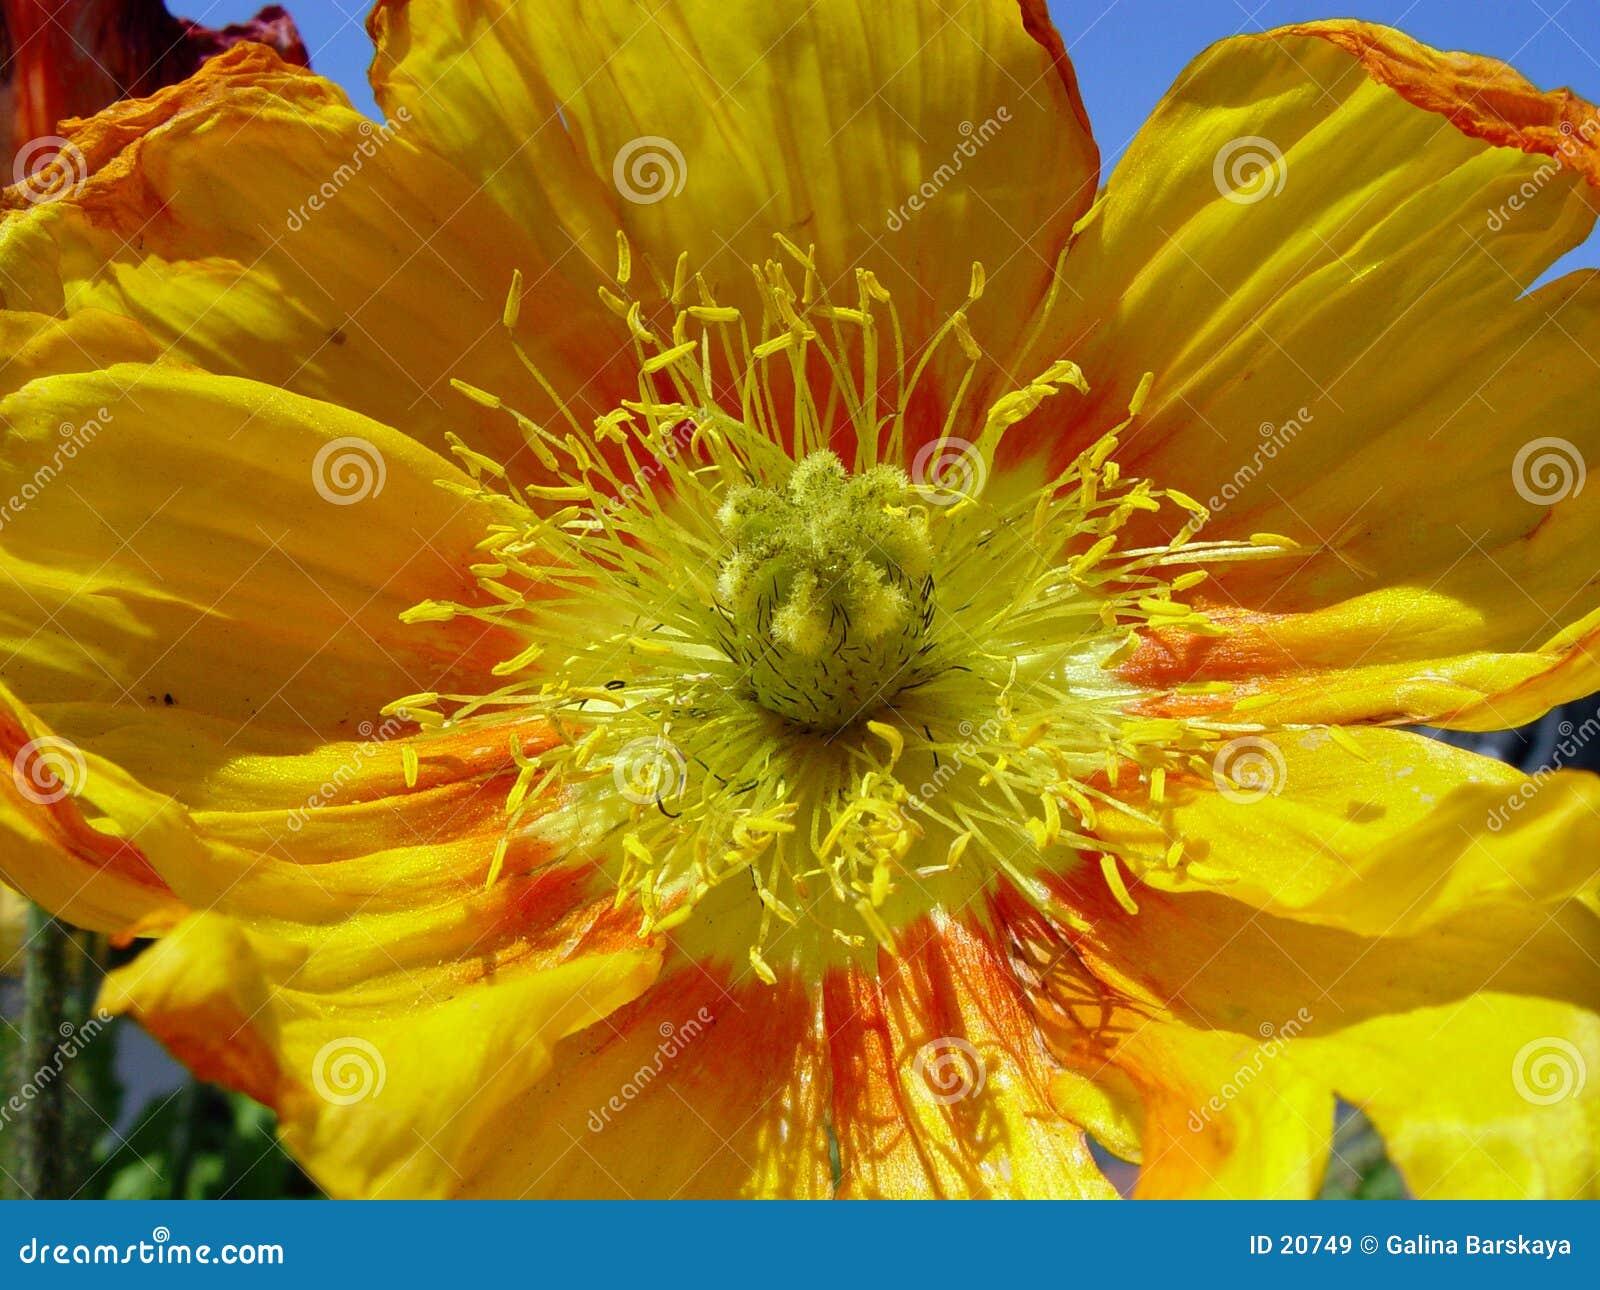 Closeup of yellow poppy